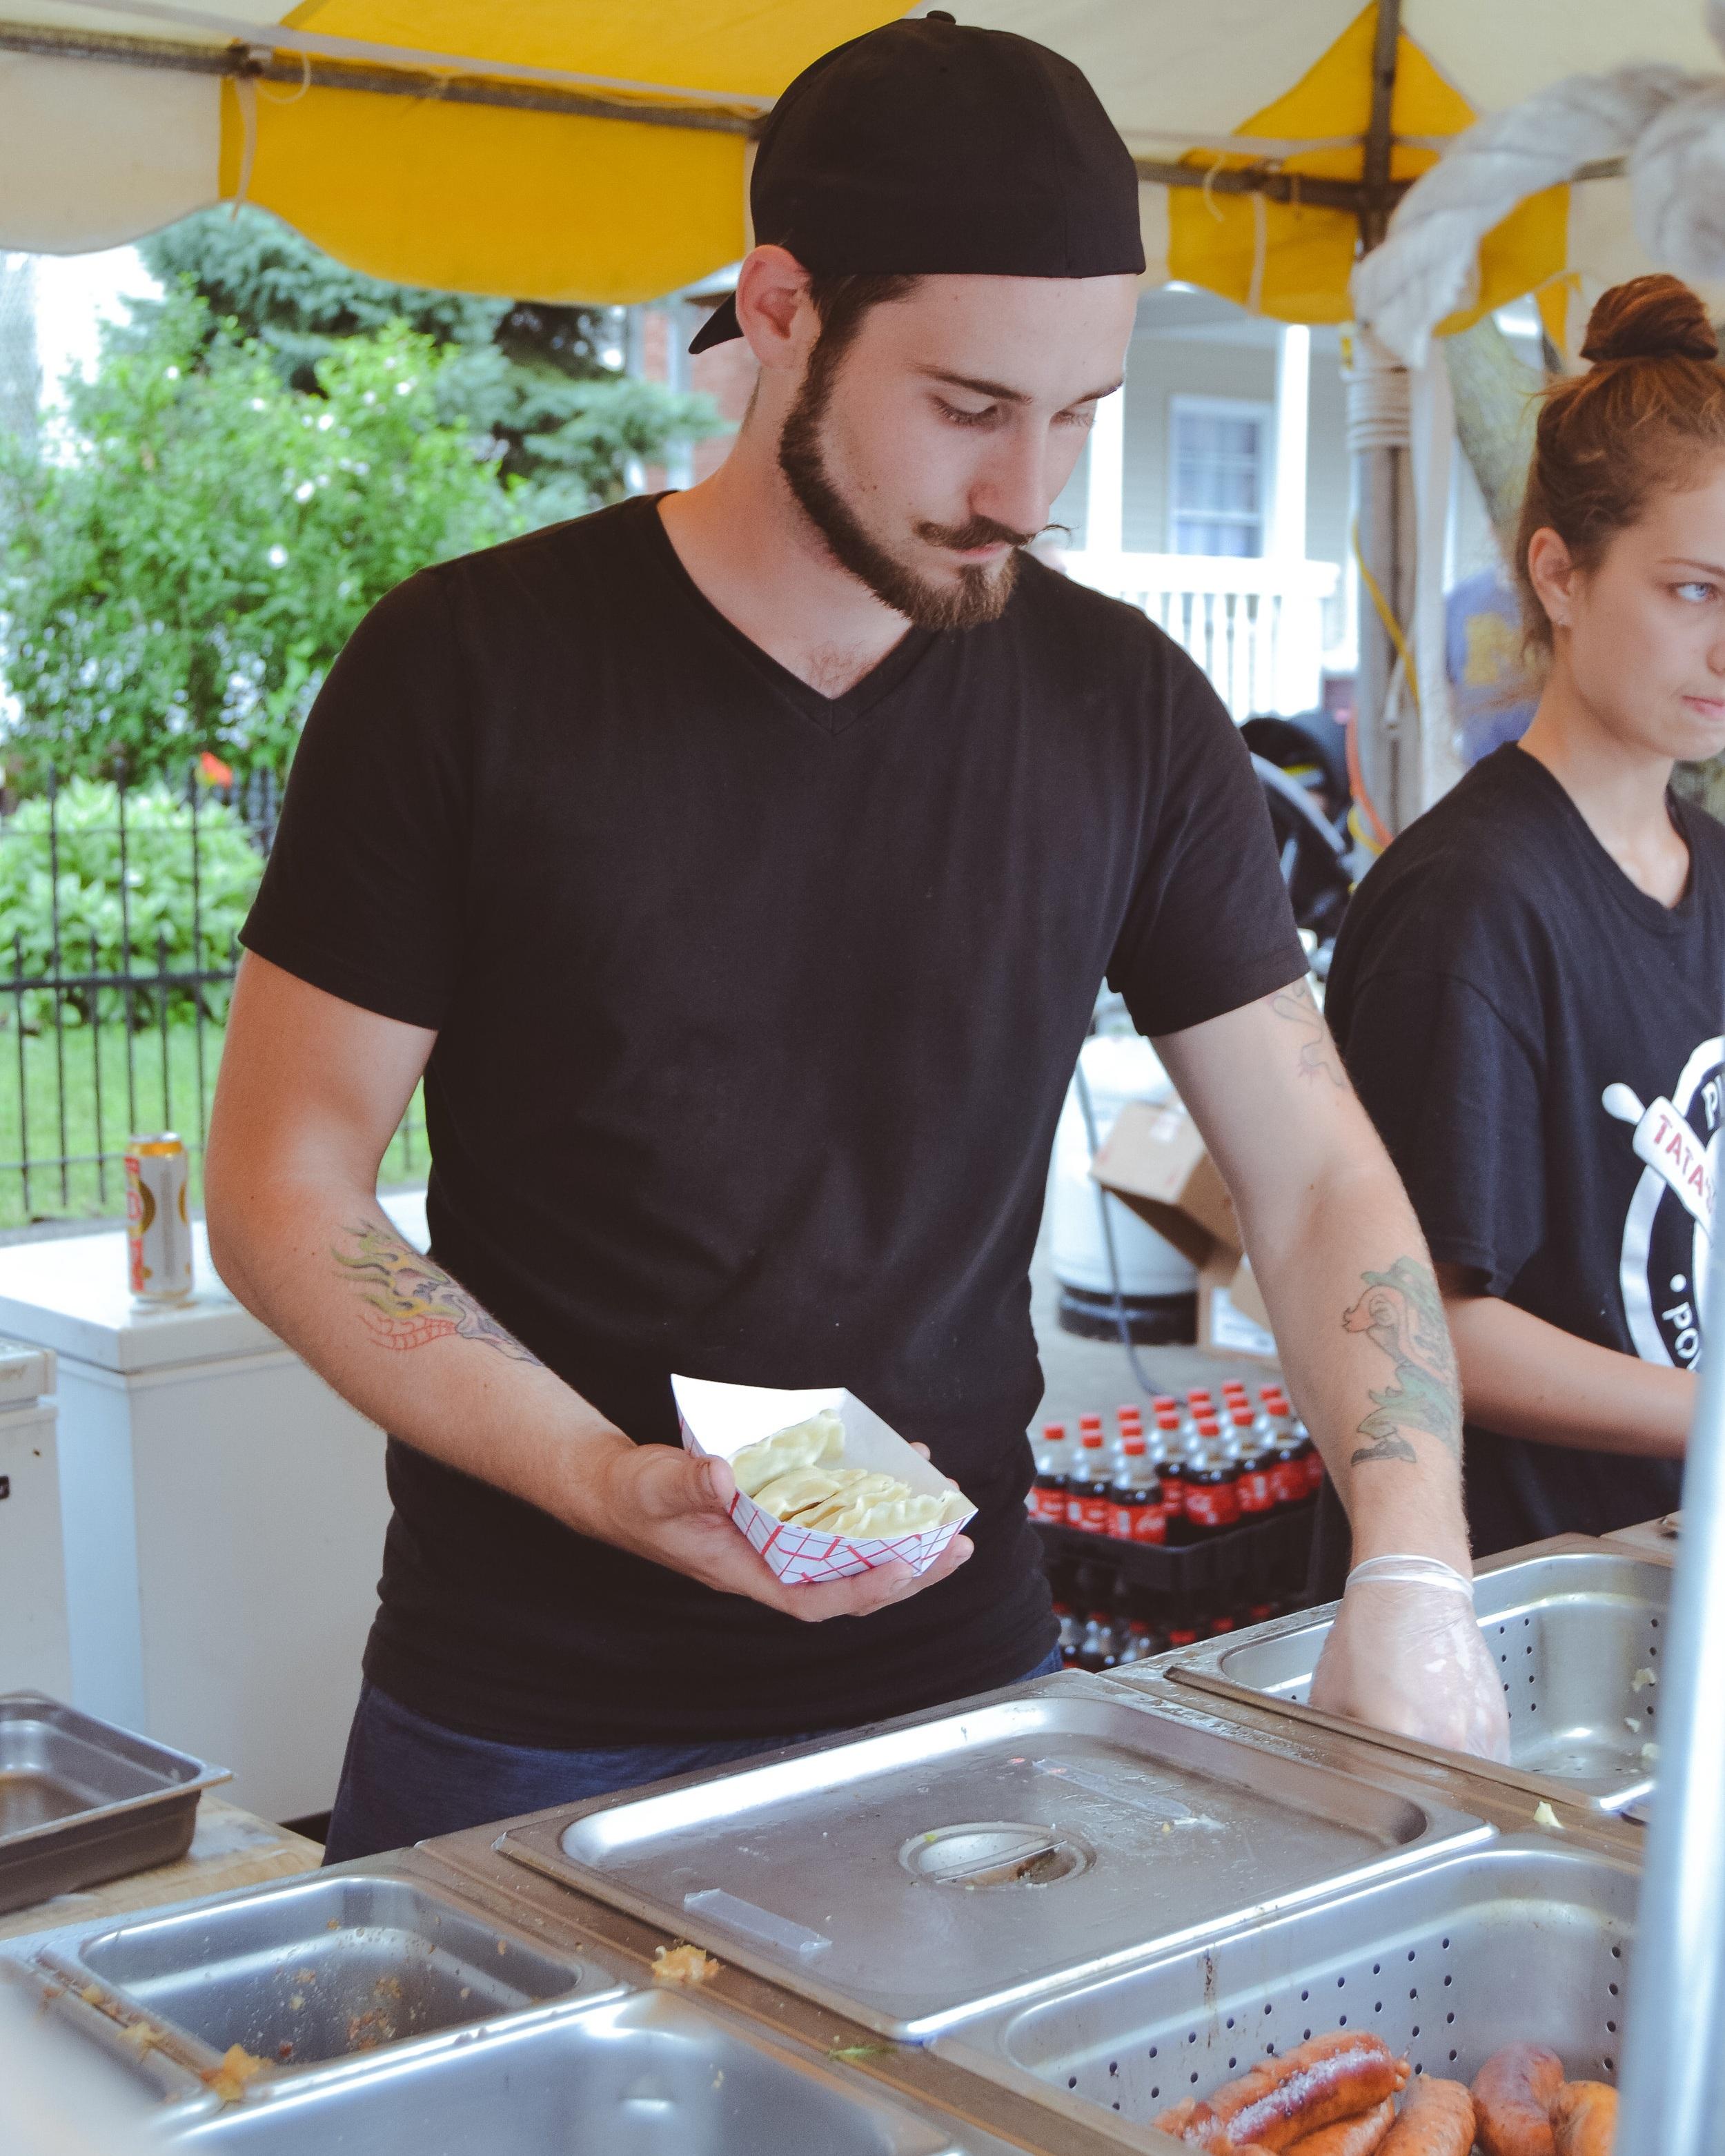 A vendor serves pierogi to a customer.  Photo by Hannah Rose Dominiak